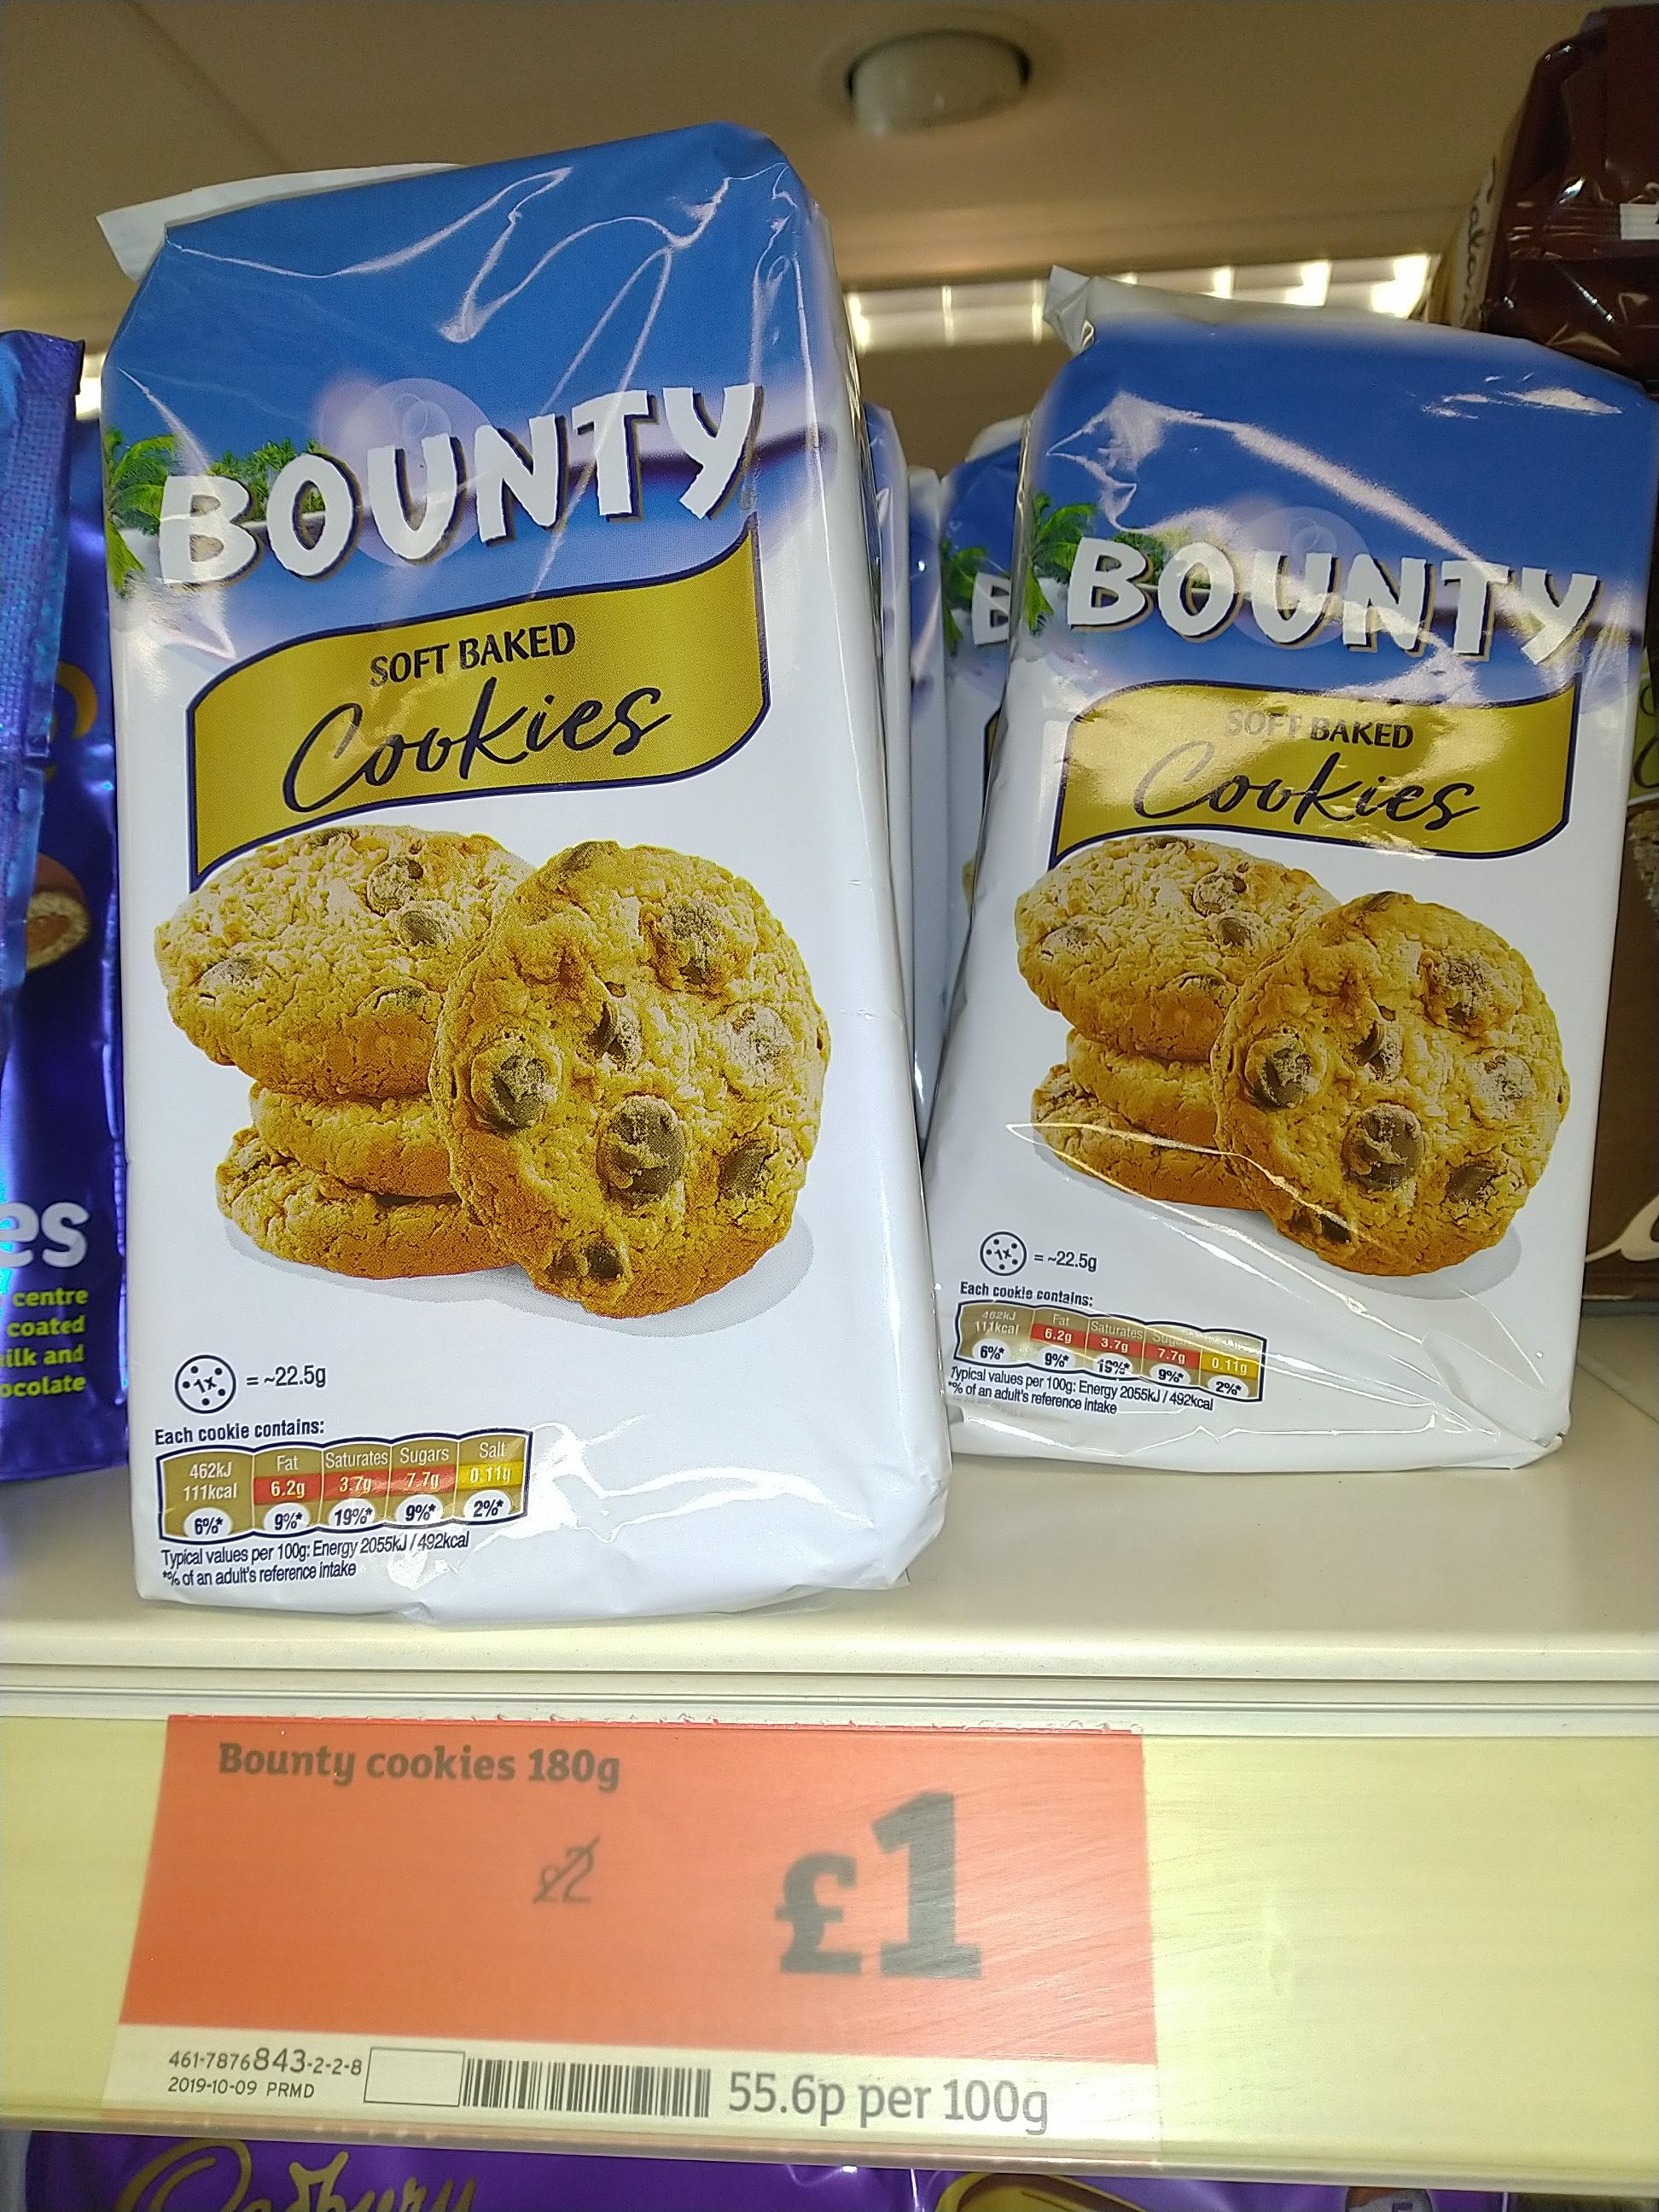 Bounty Cookies - £1.00 in Sainsbury's online /In-store